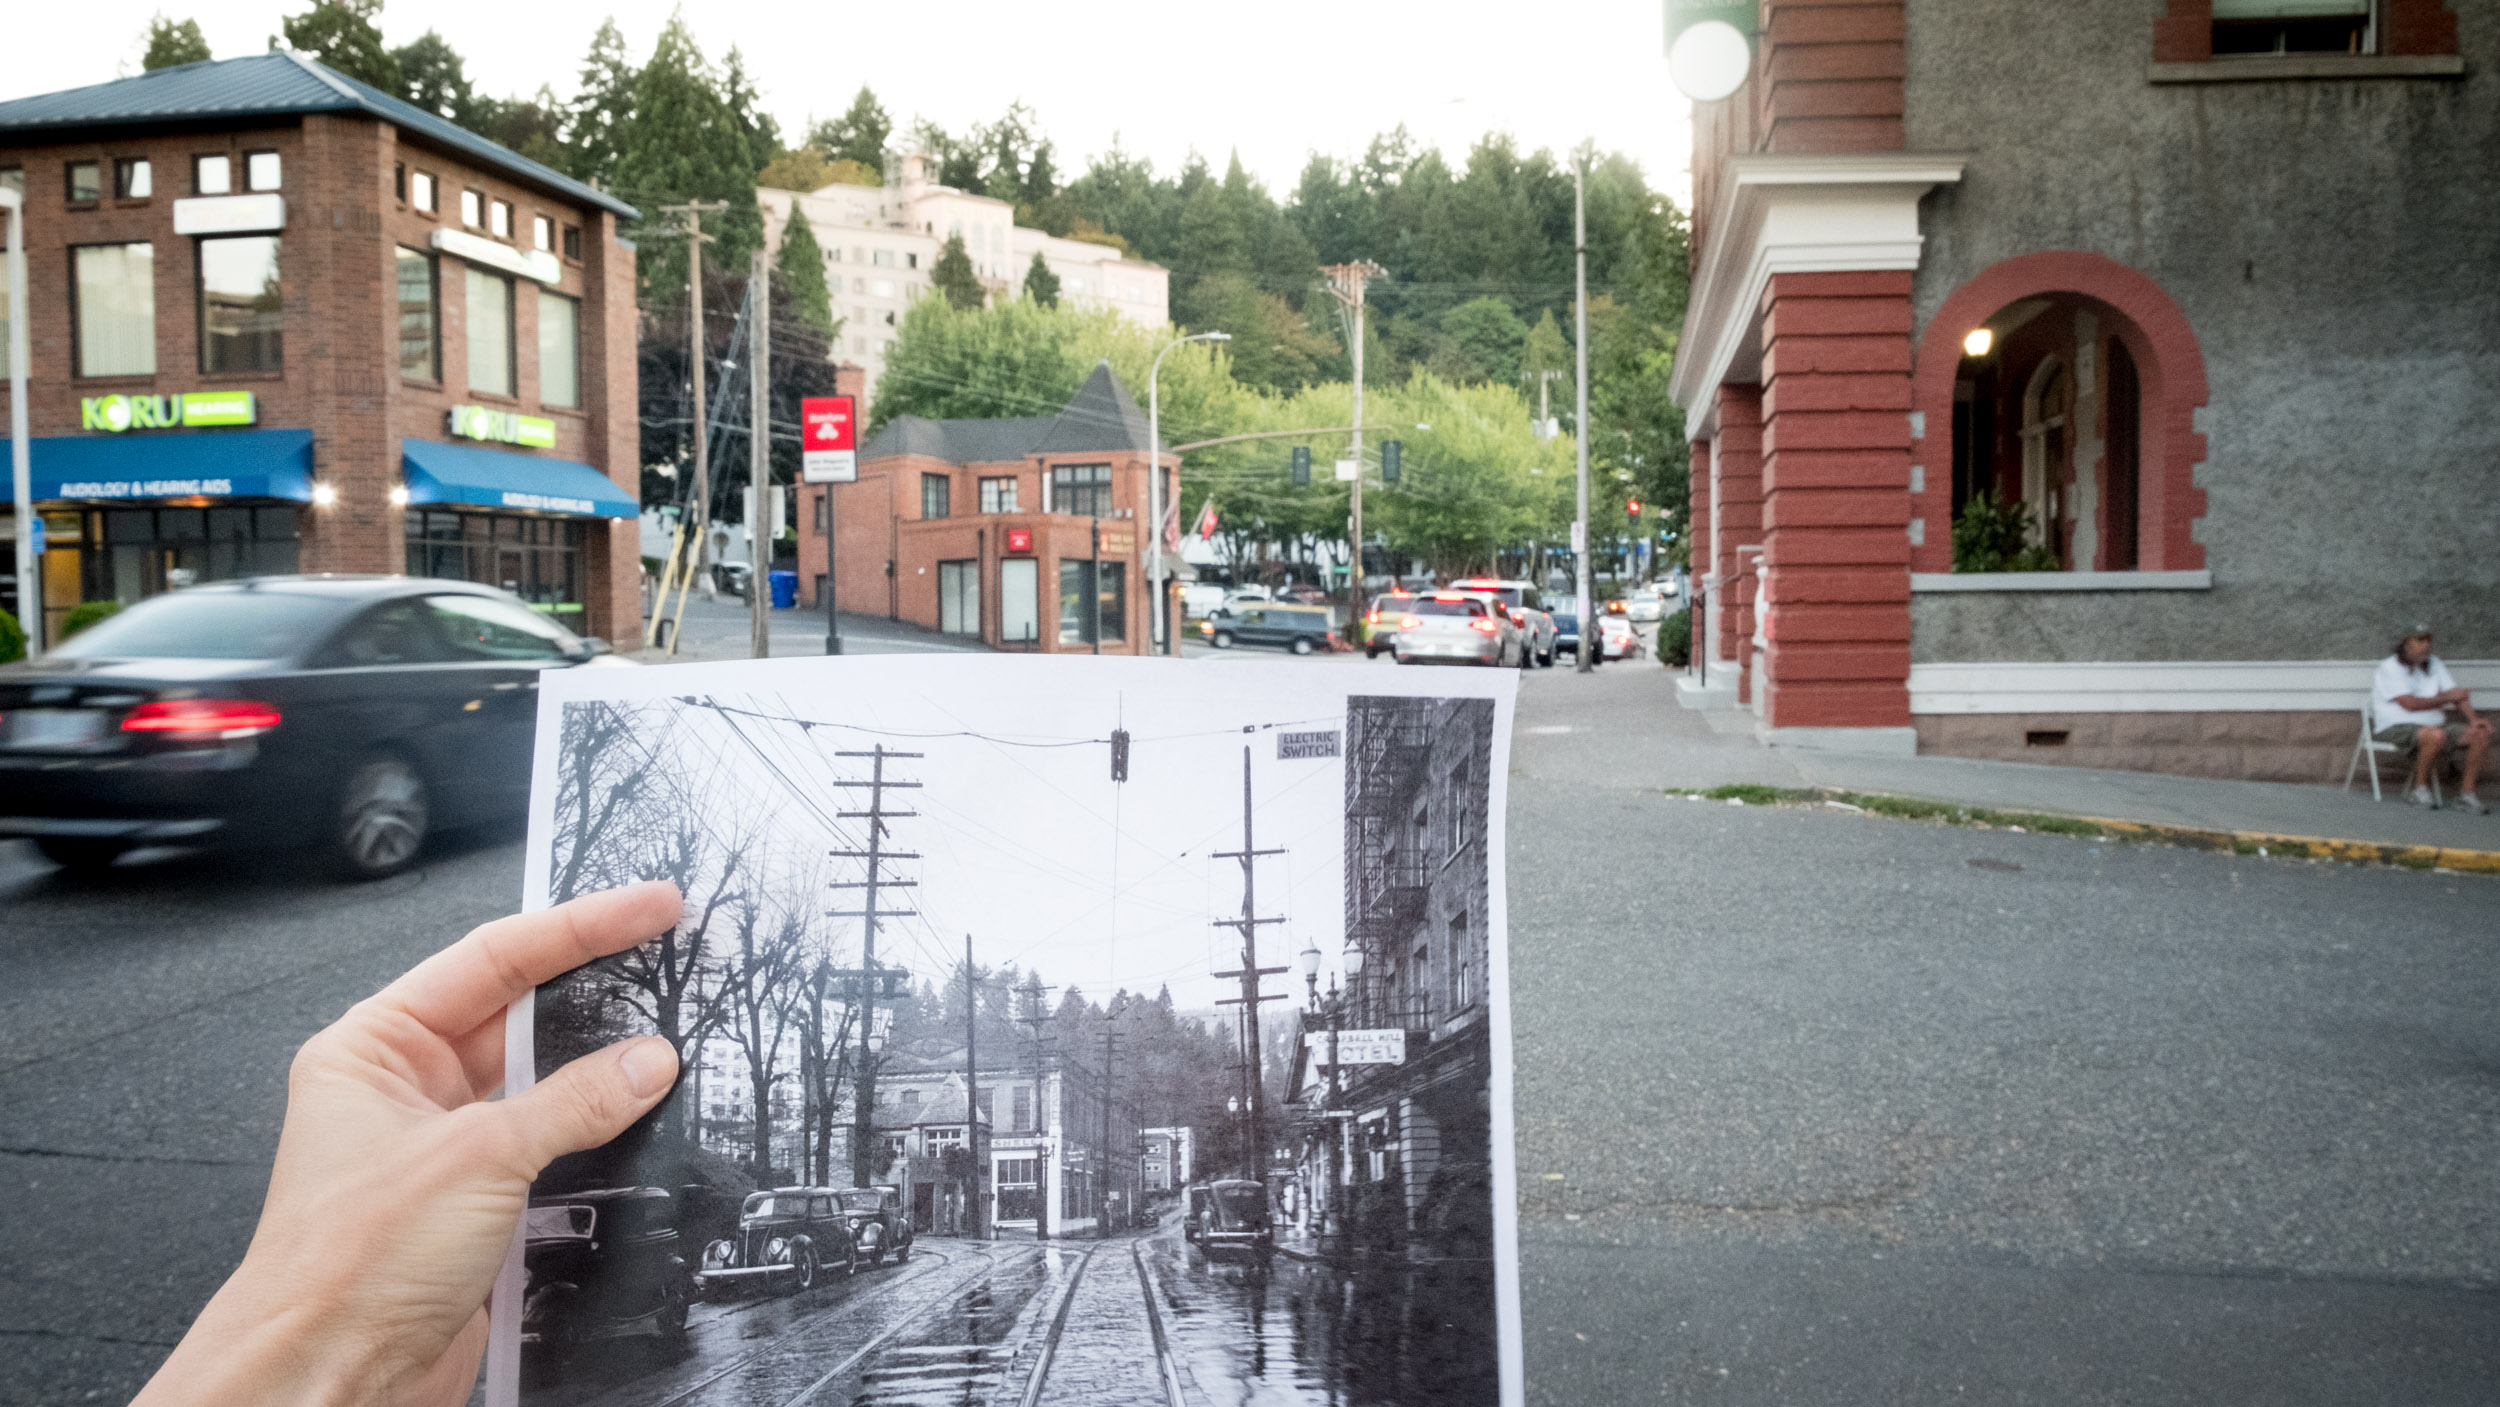 Portland NW 23rd and Burnside comparisons-16.jpg